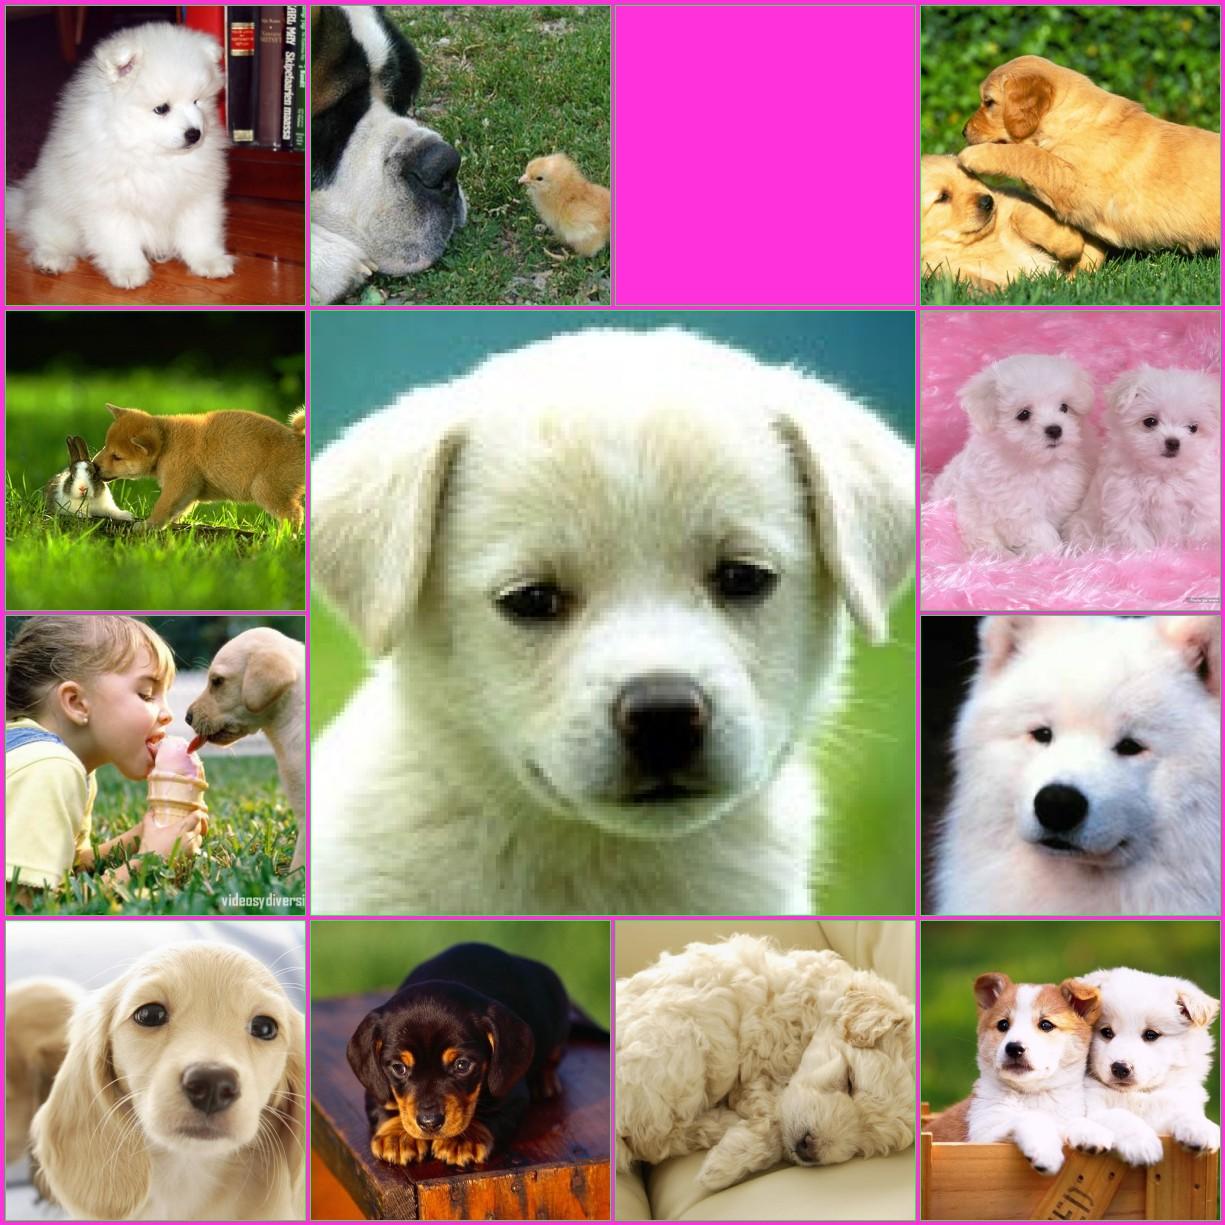 fotos de perritos - photo #29